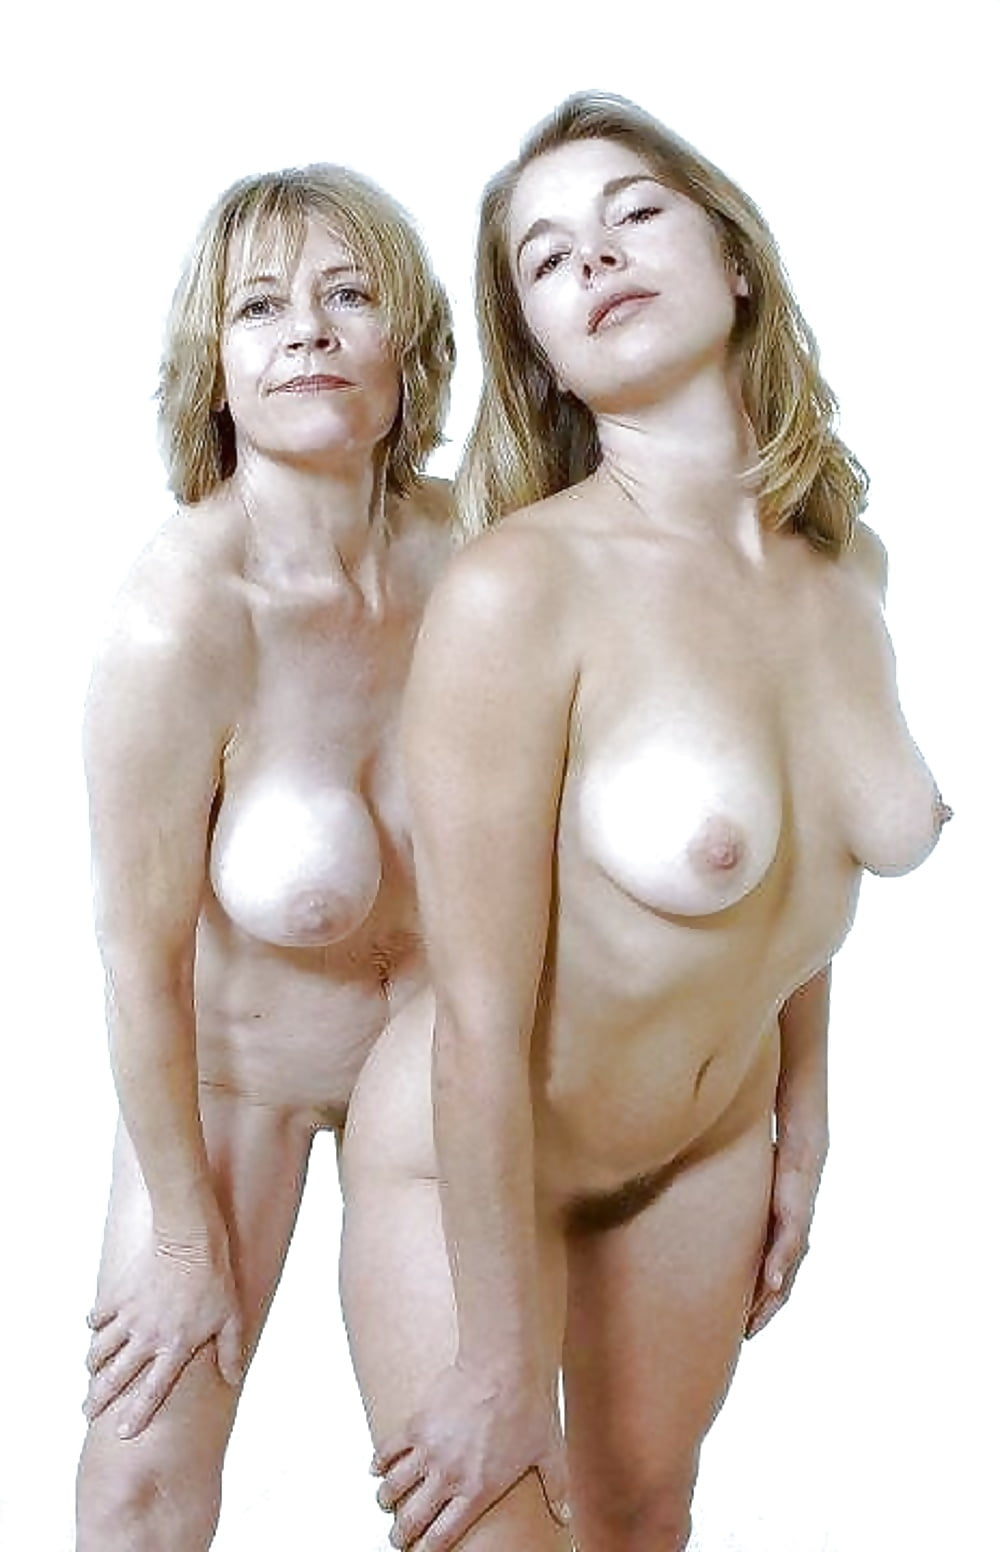 Naked bi mother daughter, german shephard porn